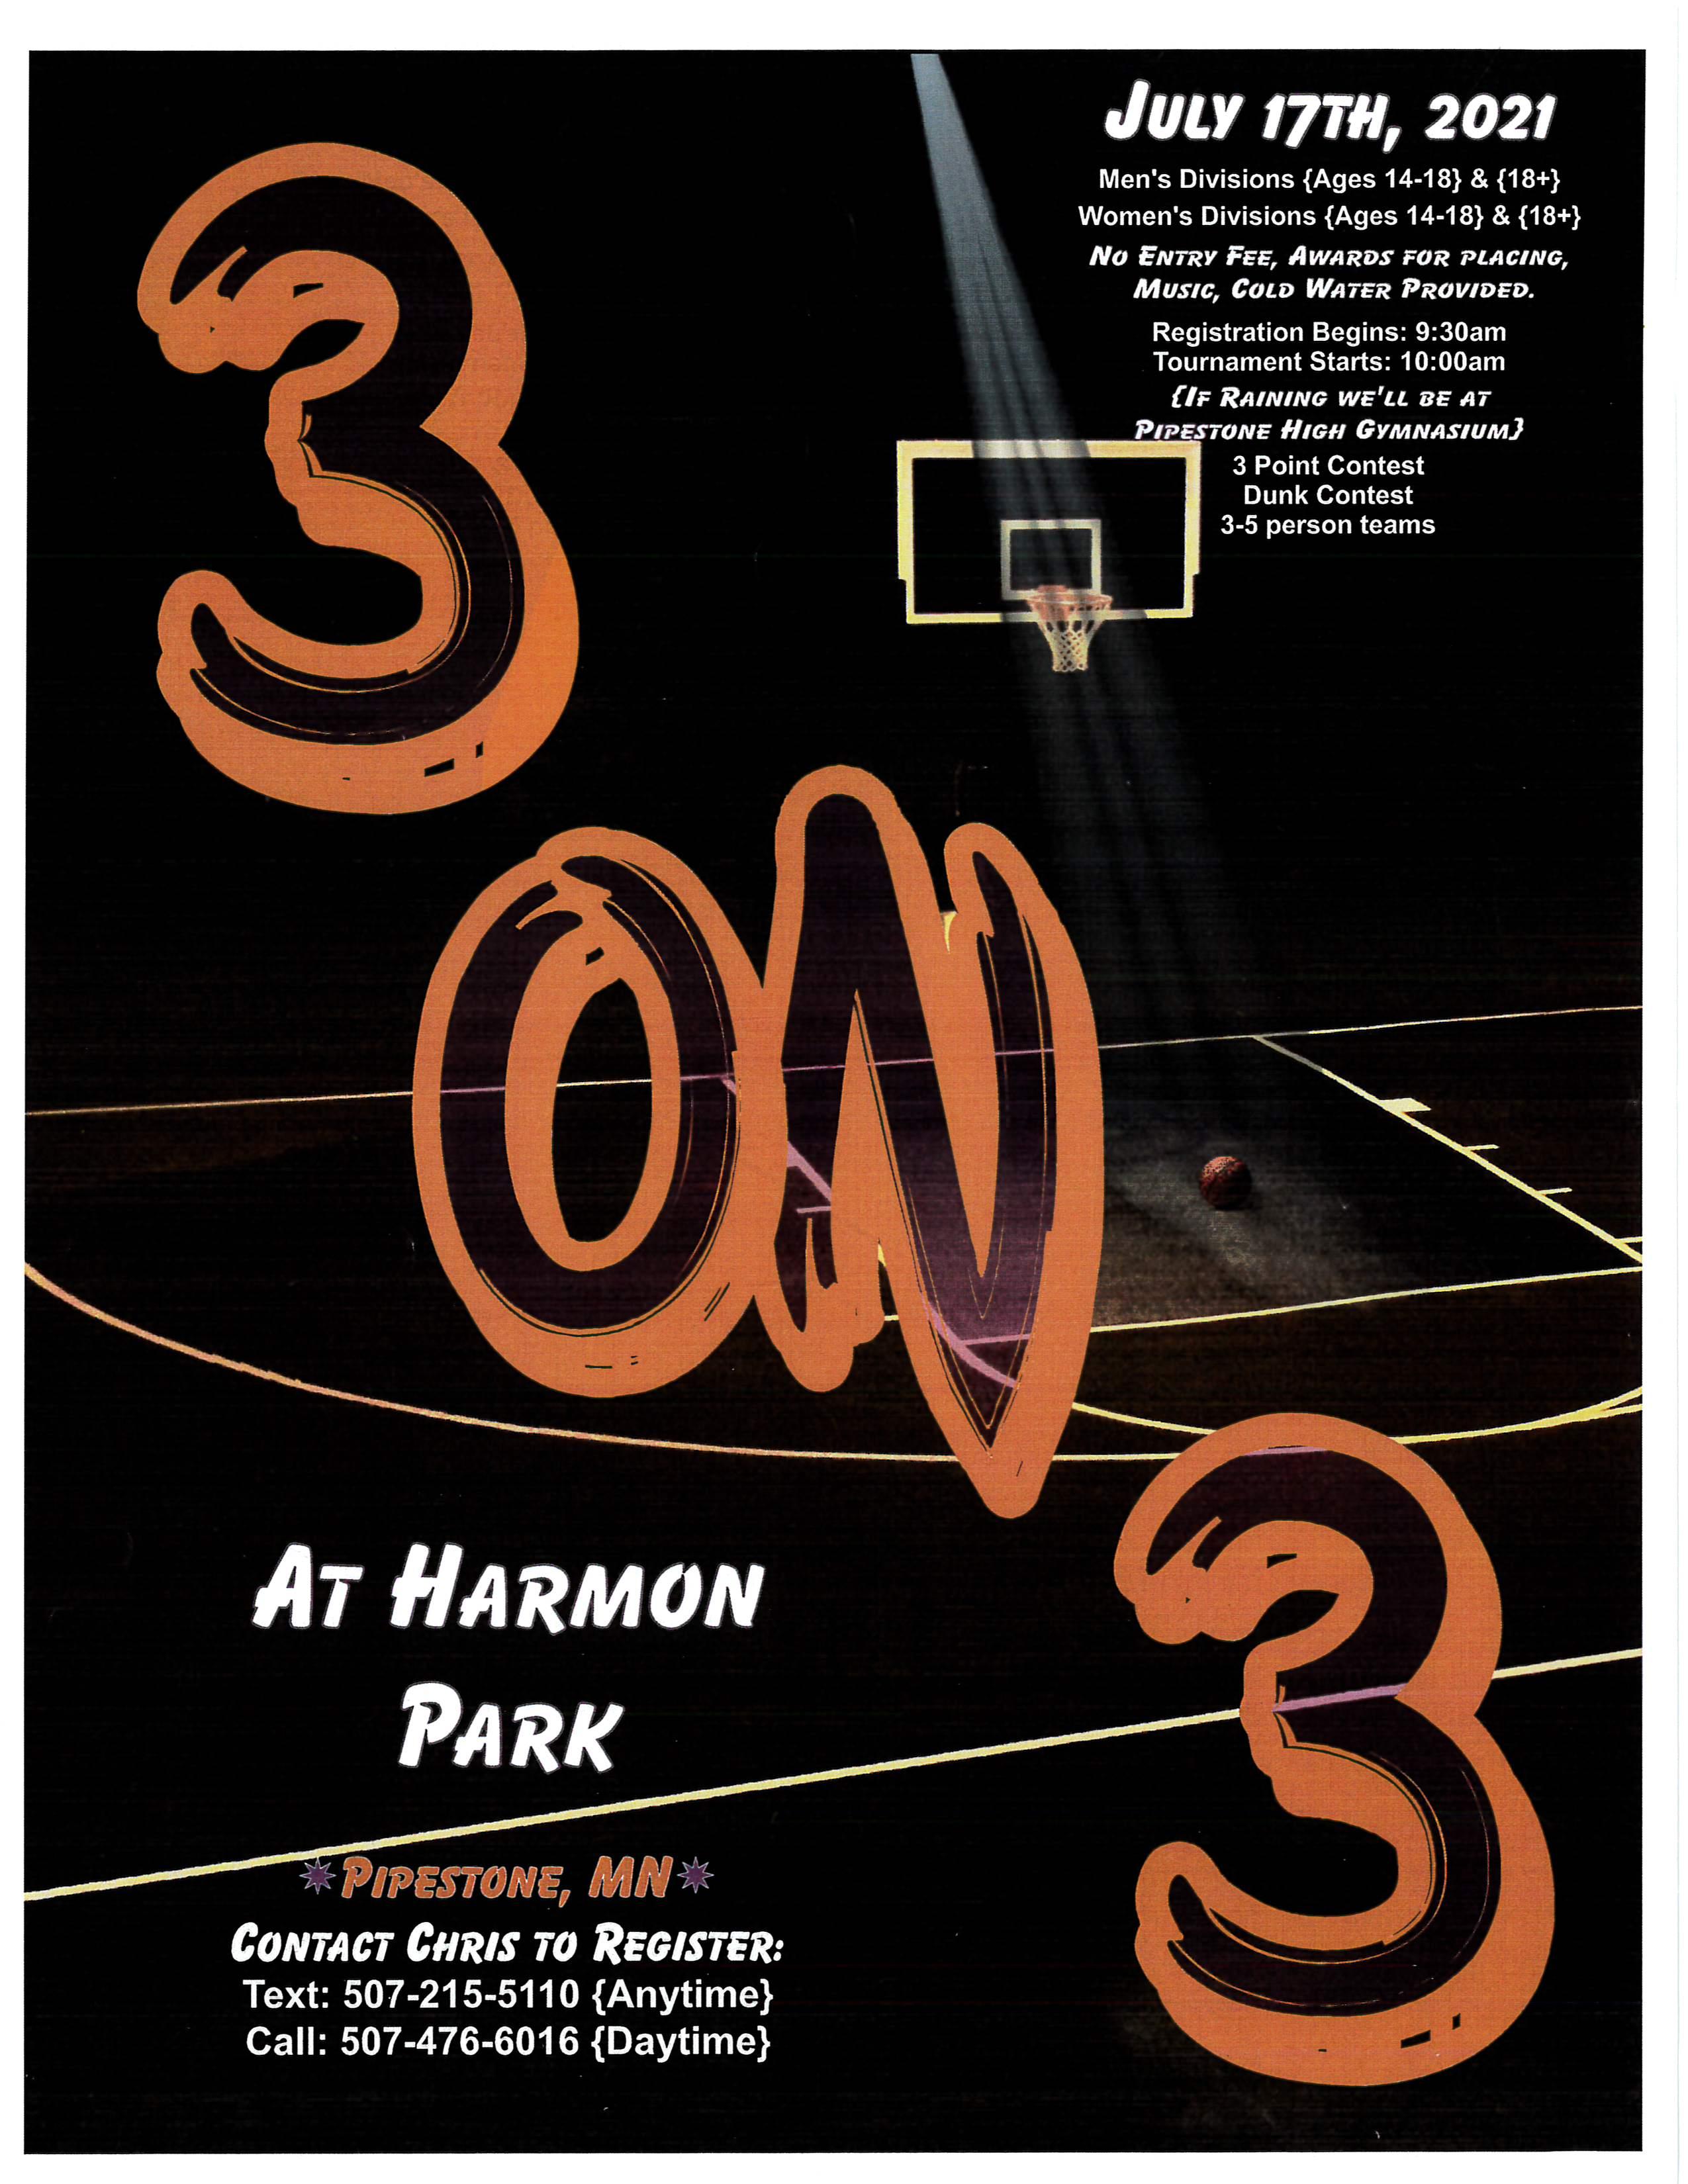 3 on 3 Basketball Tournament at Harmon Park